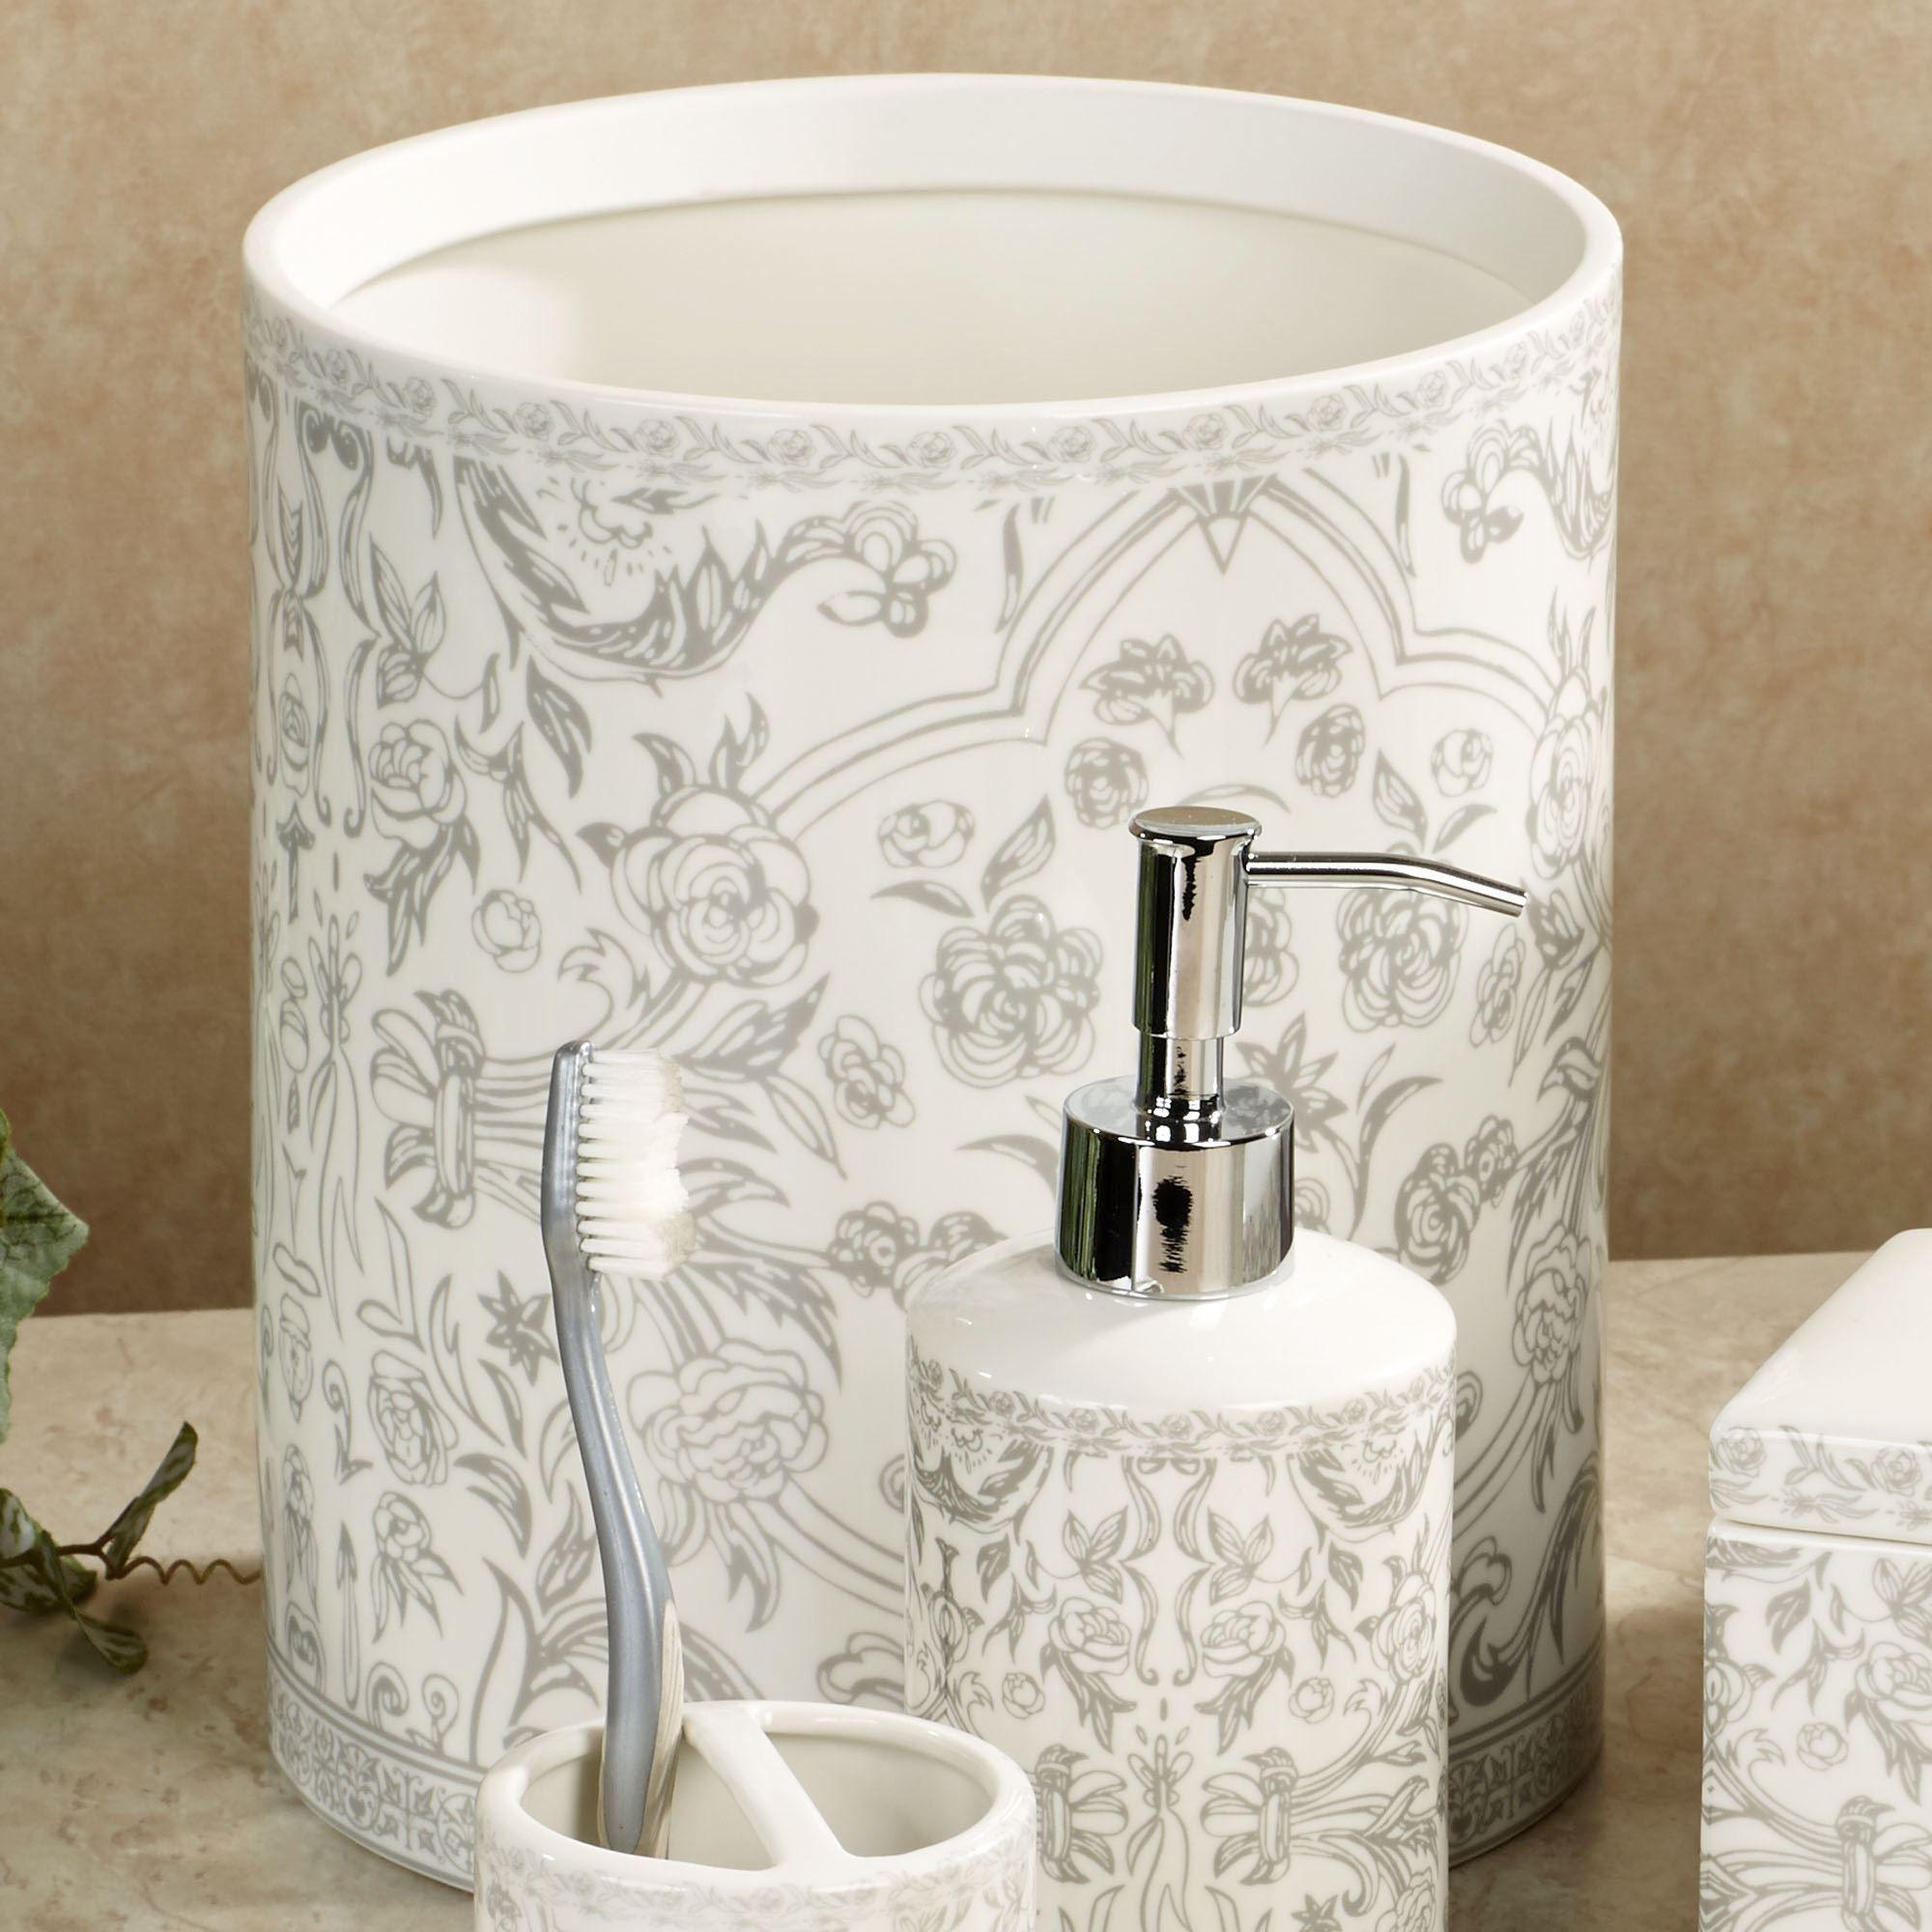 Orsay Gray Toile Porcelain Wastebasket